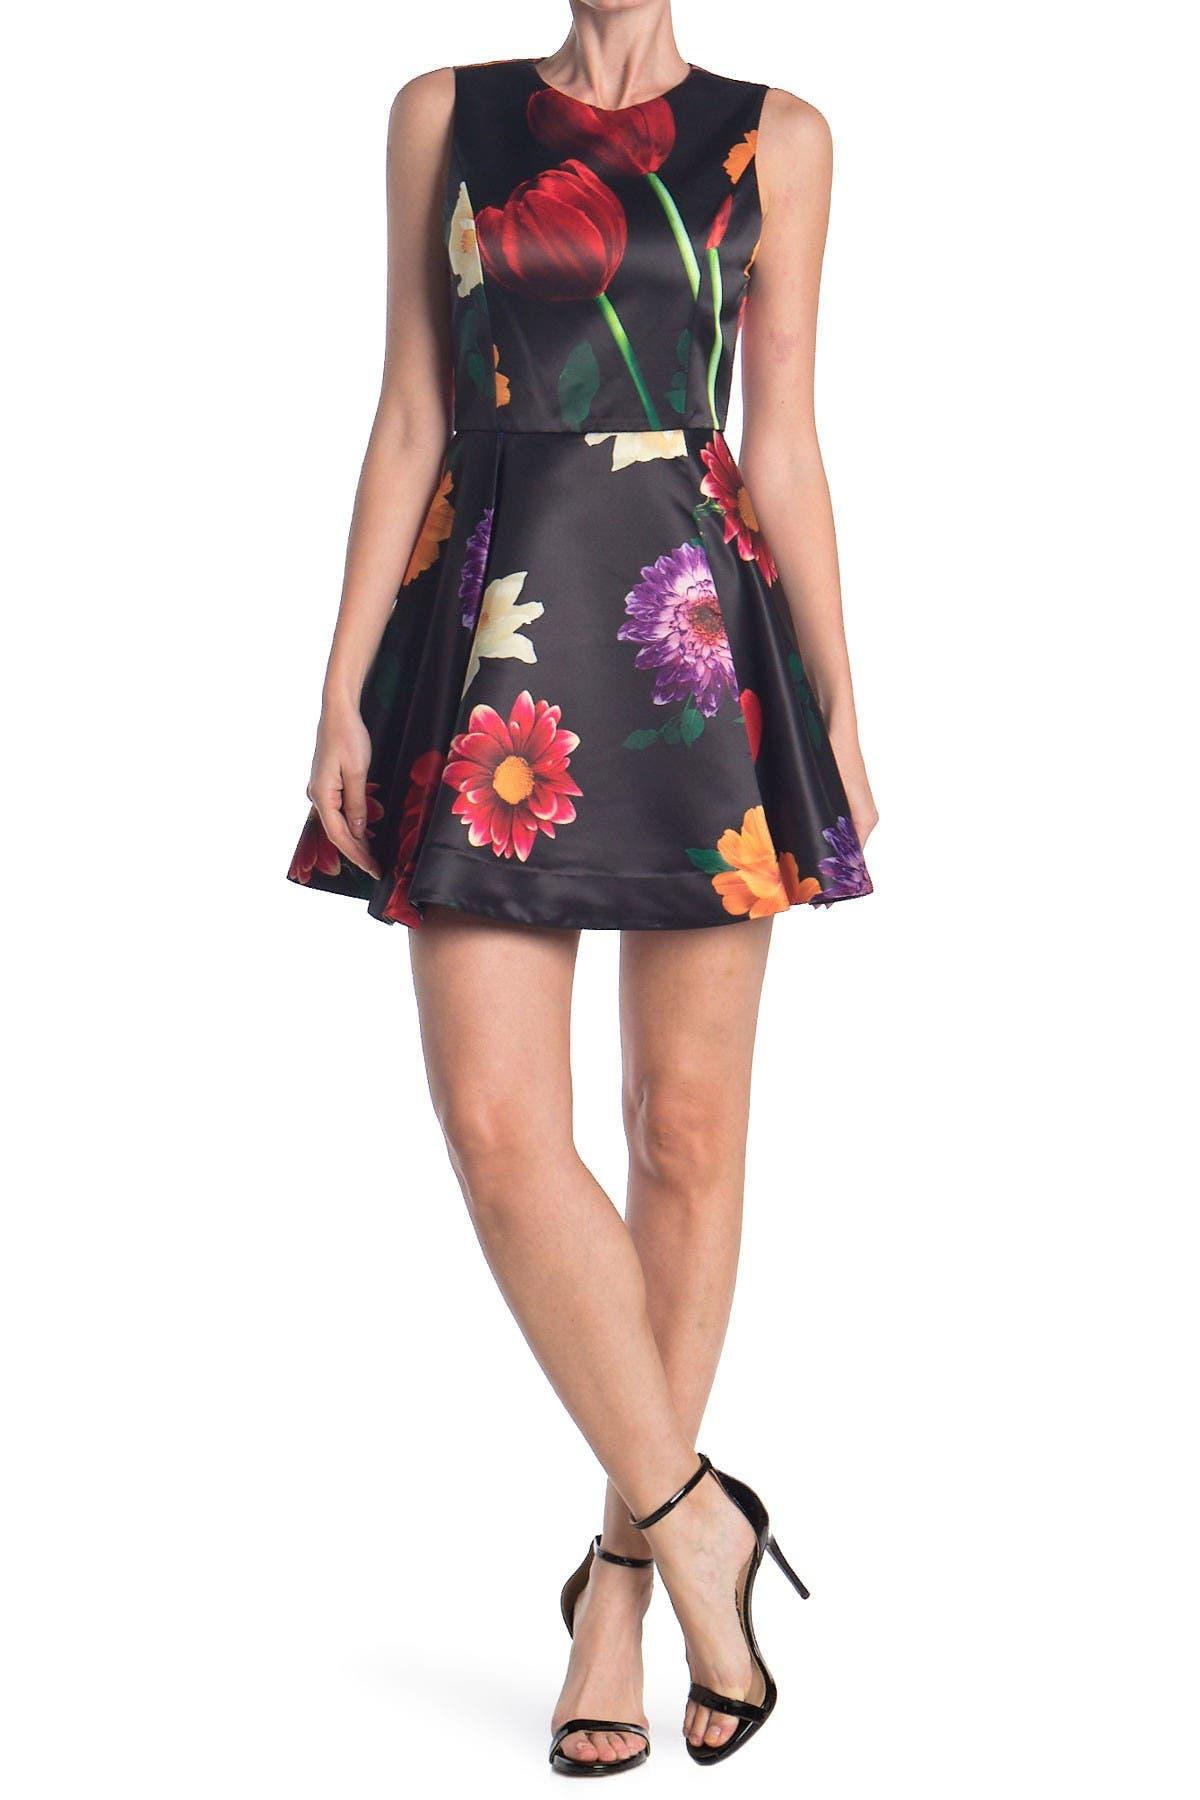 Alice + olivia Stasia Floral Skater Party Dress